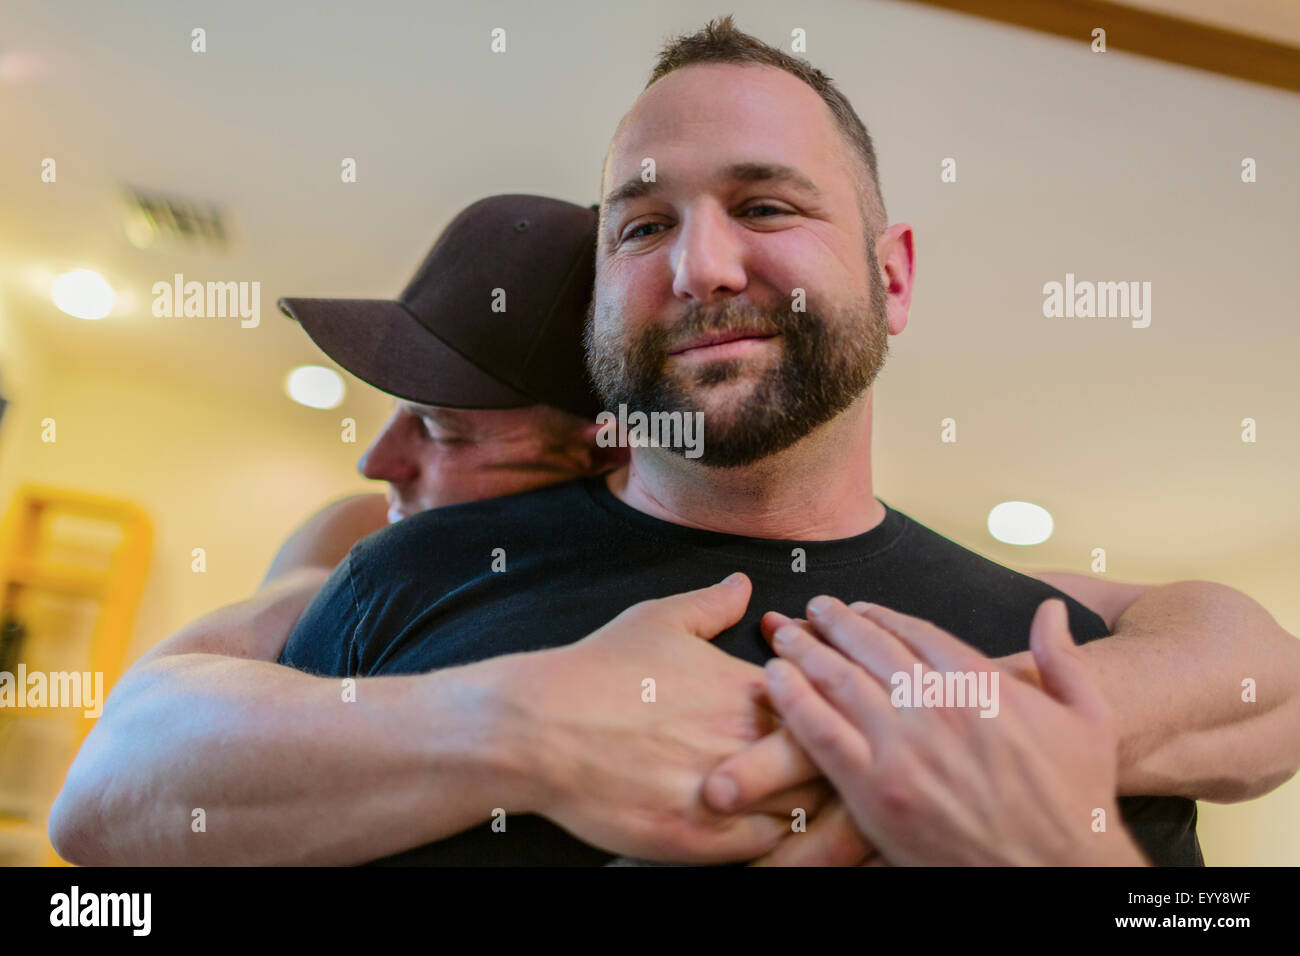 Nahaufnahme eines schwulen Paares umarmen Stockfoto